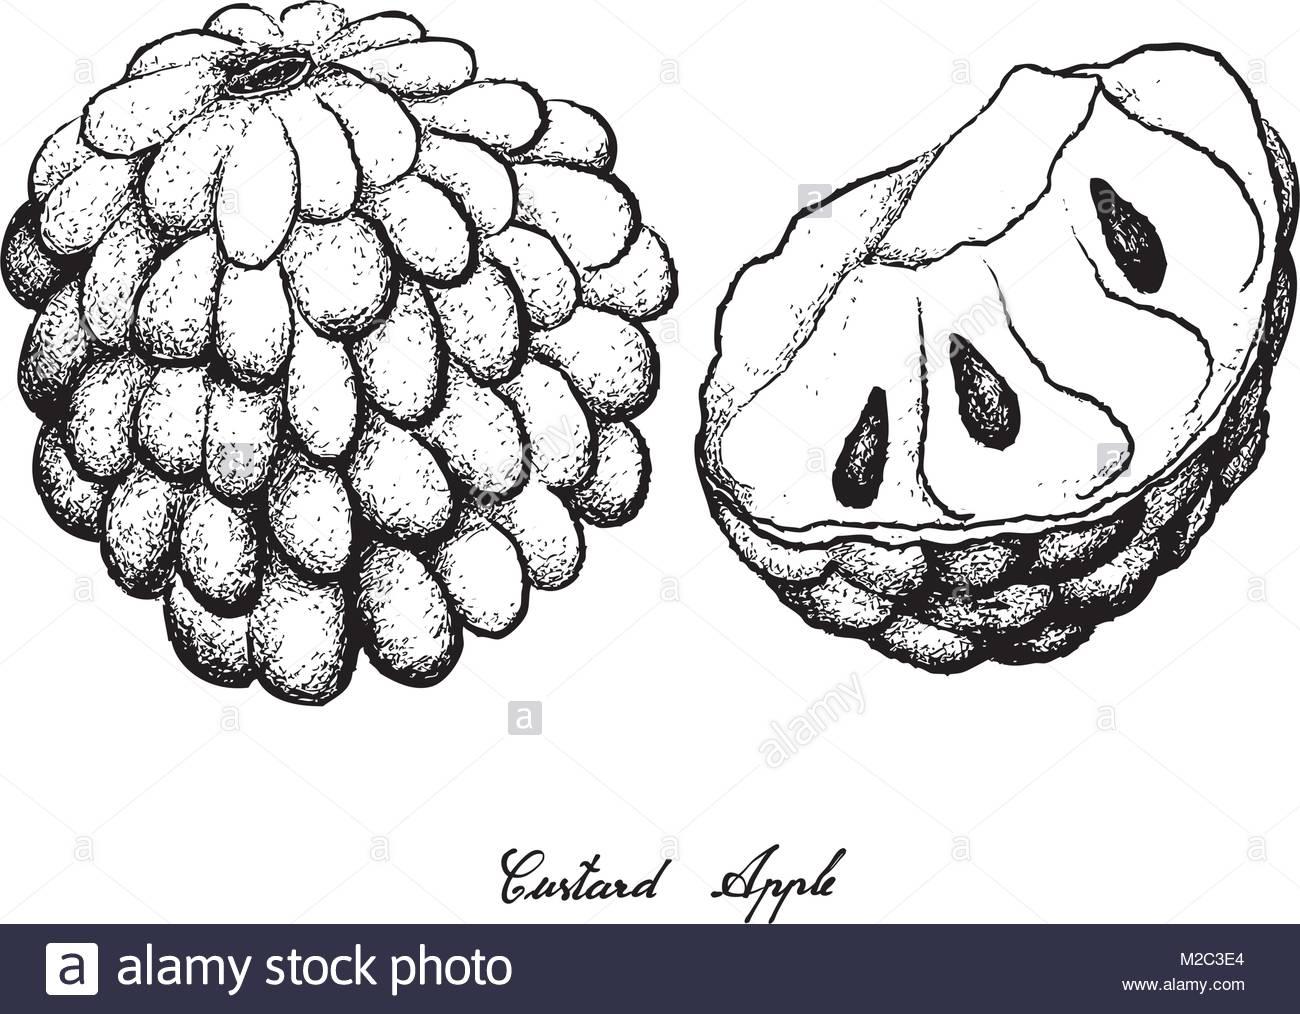 1300x1014 Tropical Fruit, Illustration Hand Drawn Sketch Of Custard Apple